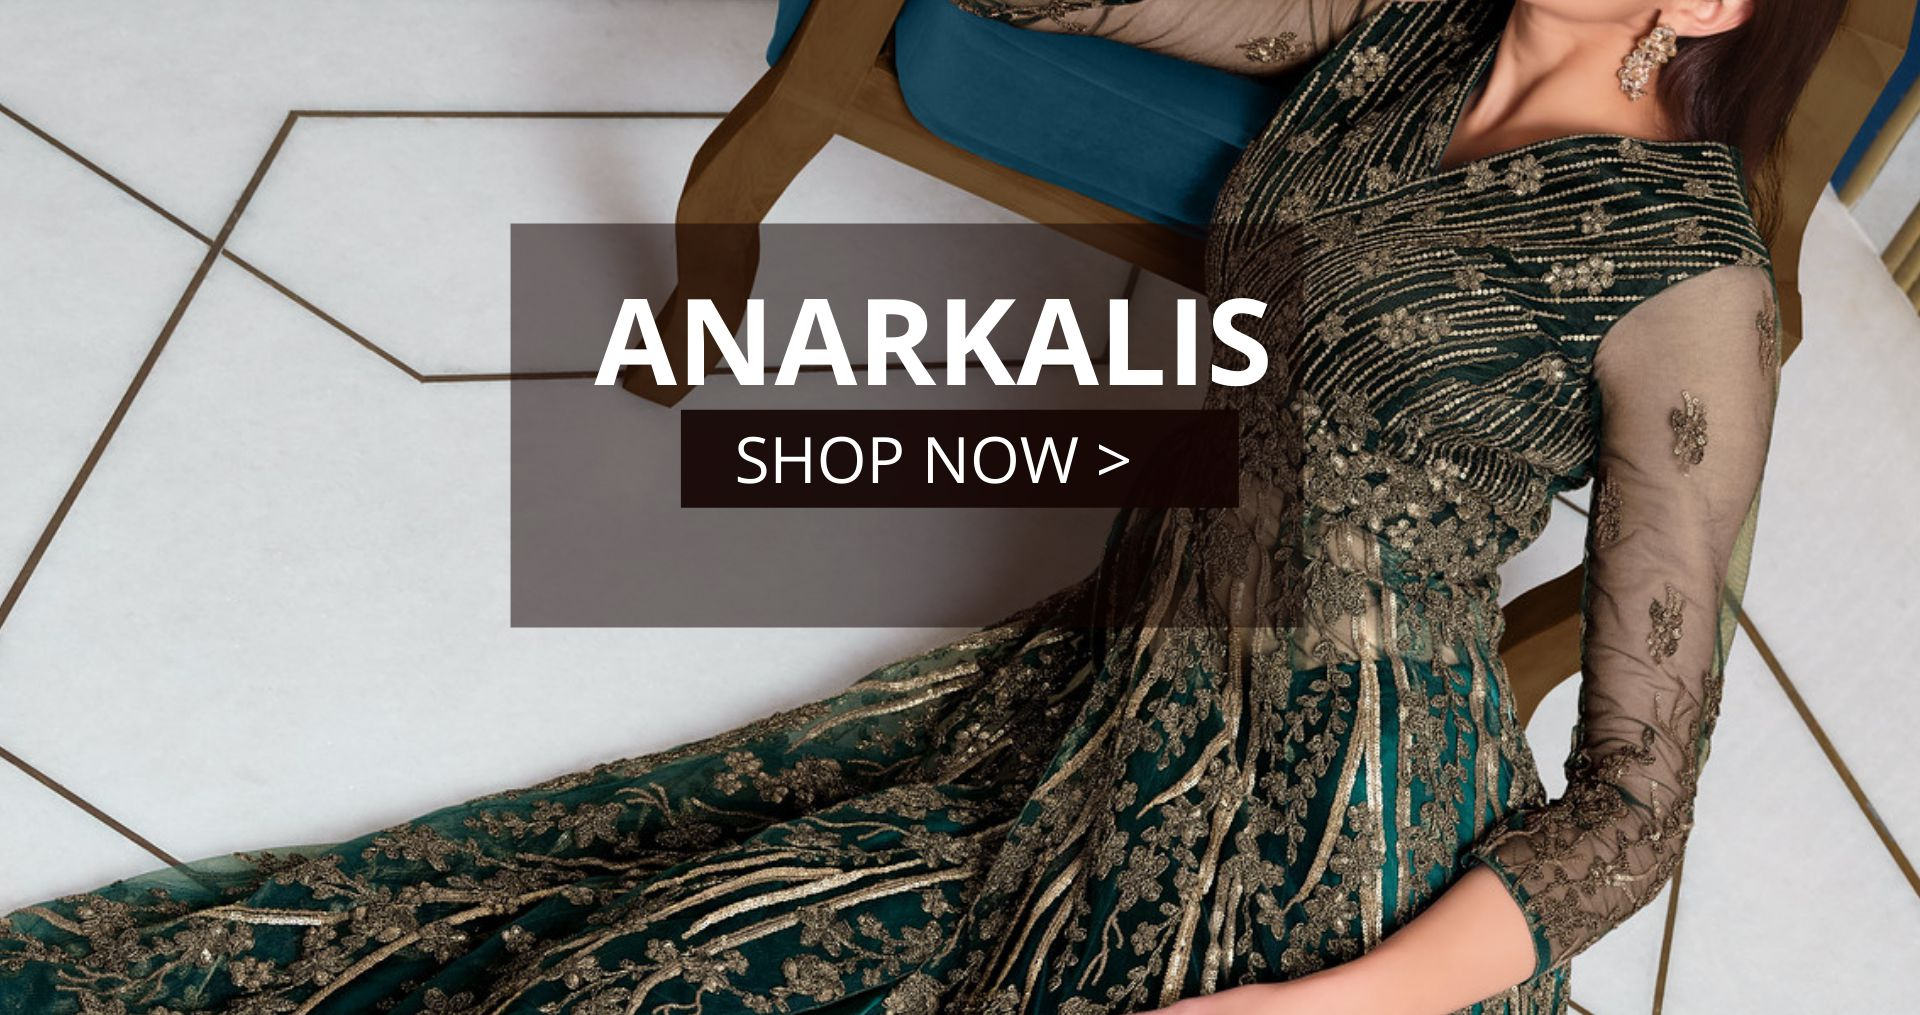 Bollywood Orginal Anarkalis